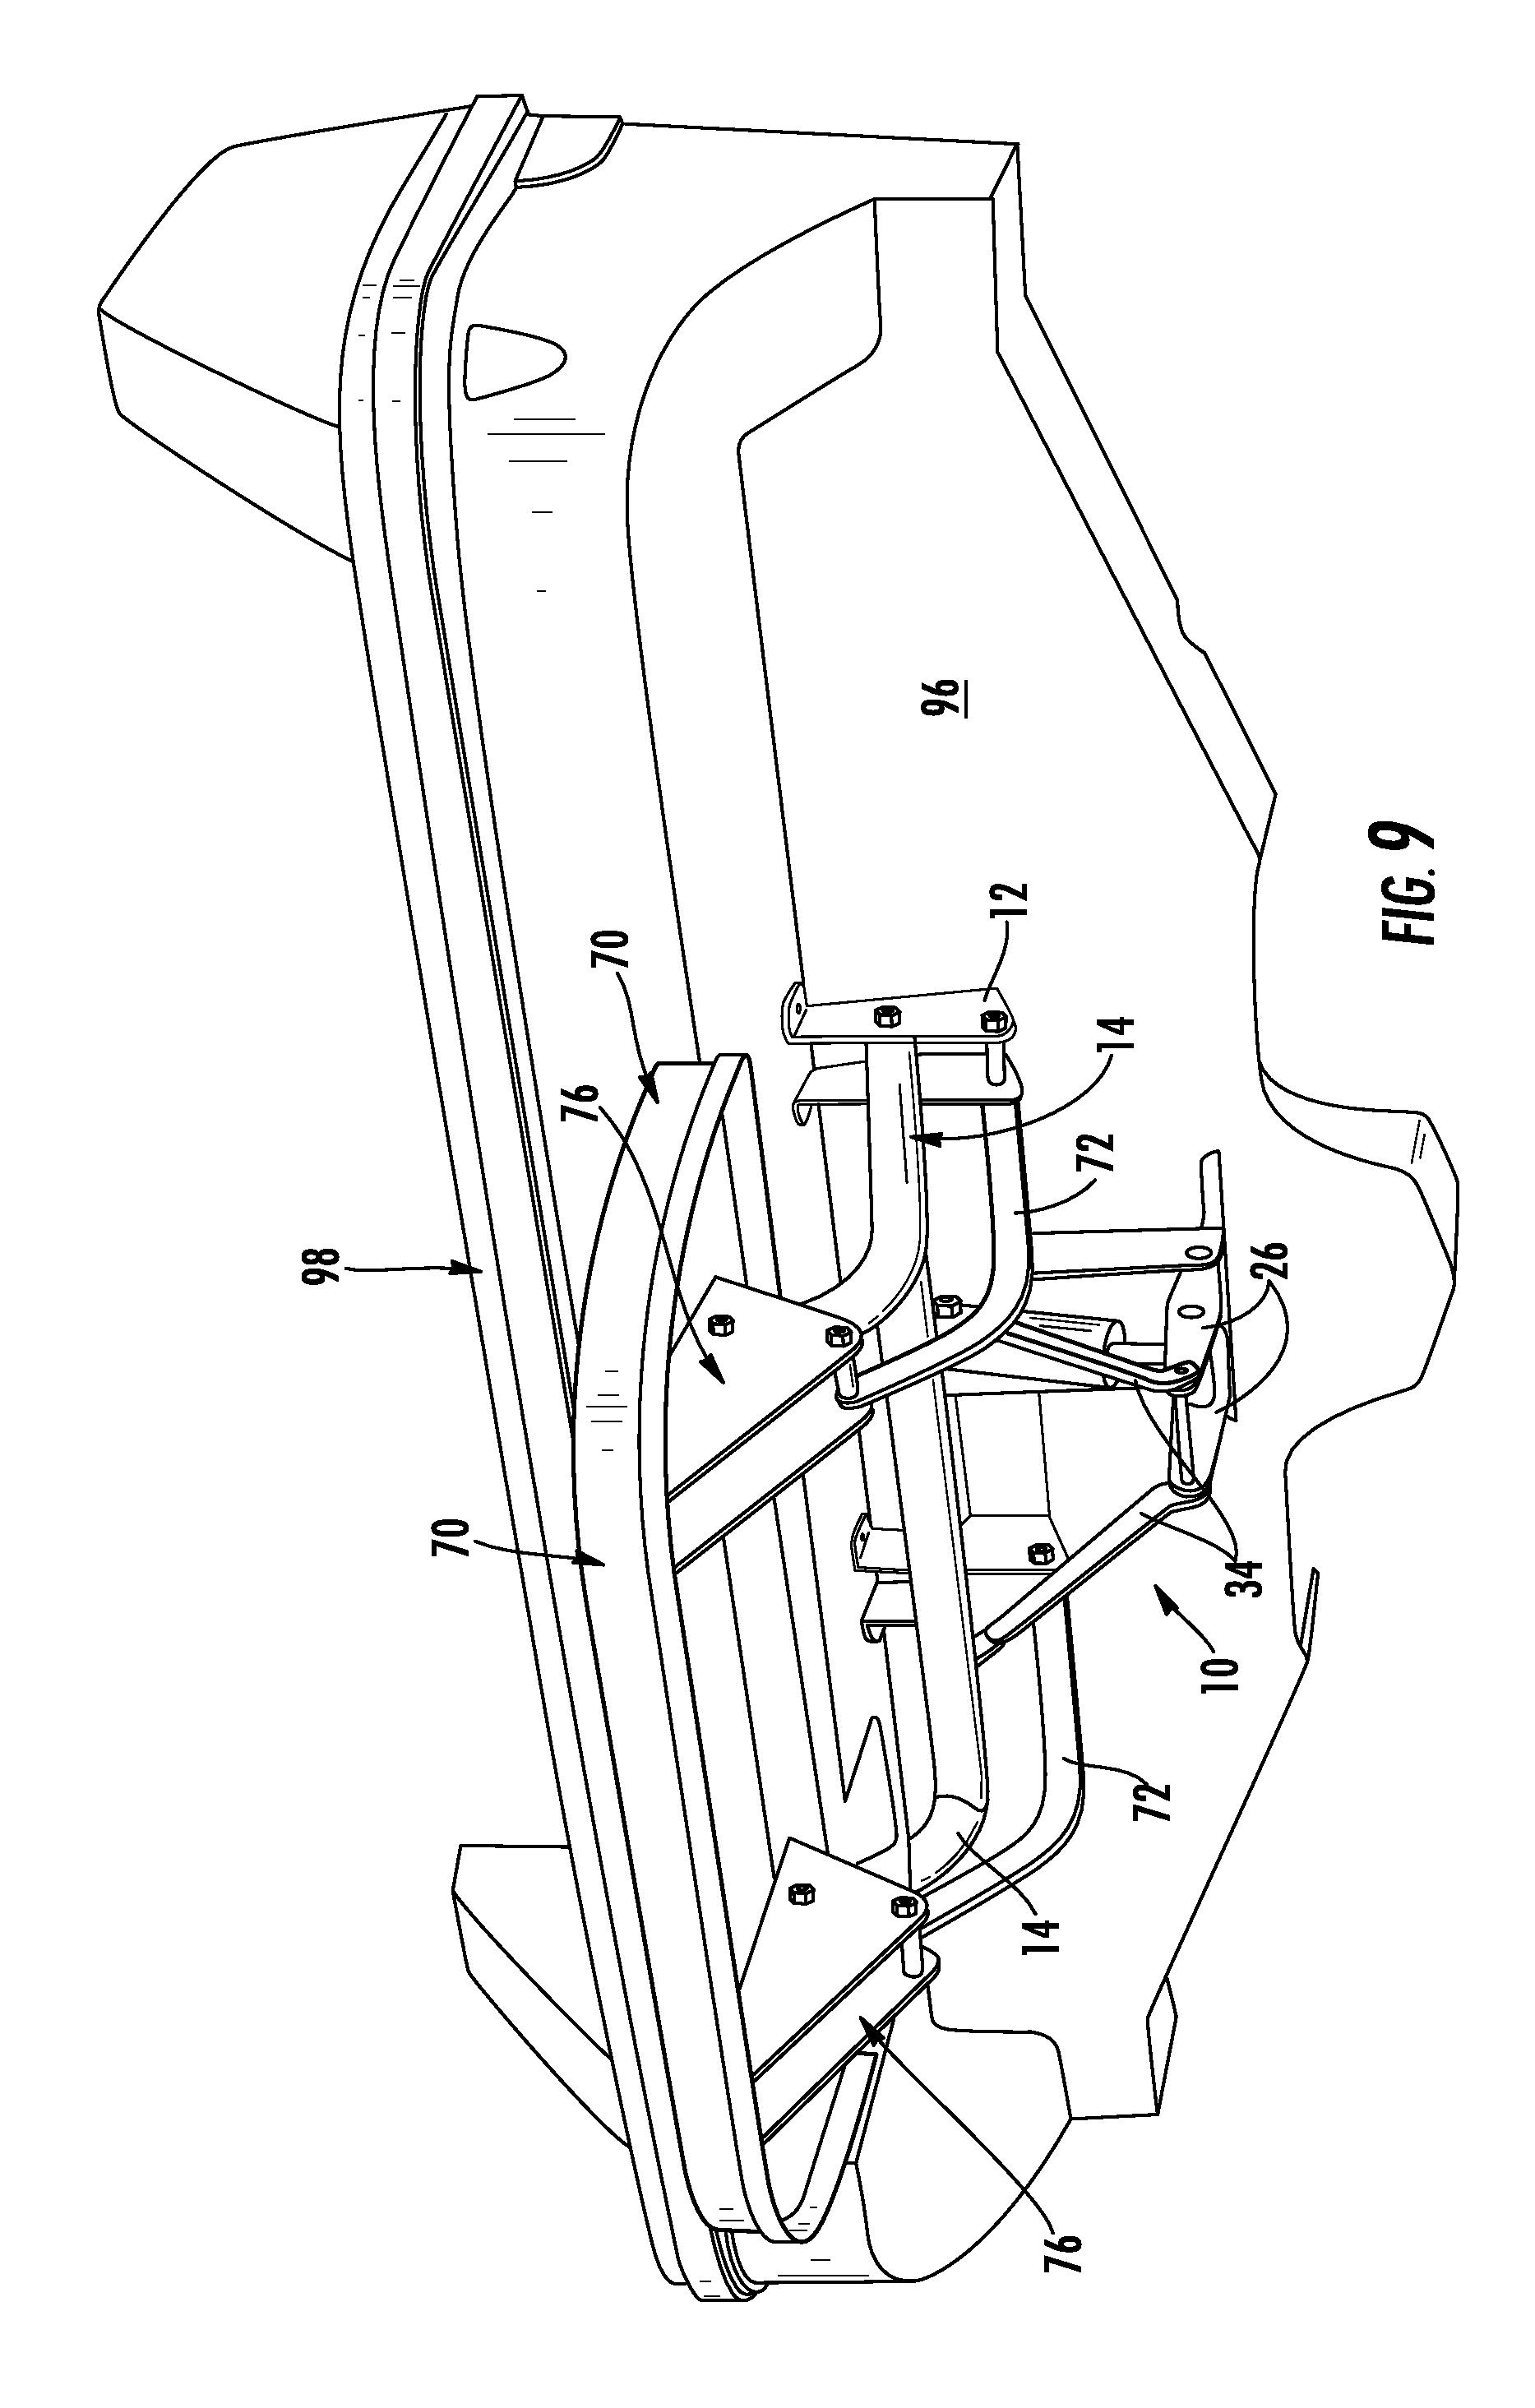 patent us7707955 transom platform lifting apparatus and method Lights Wiring Diagram patent drawing